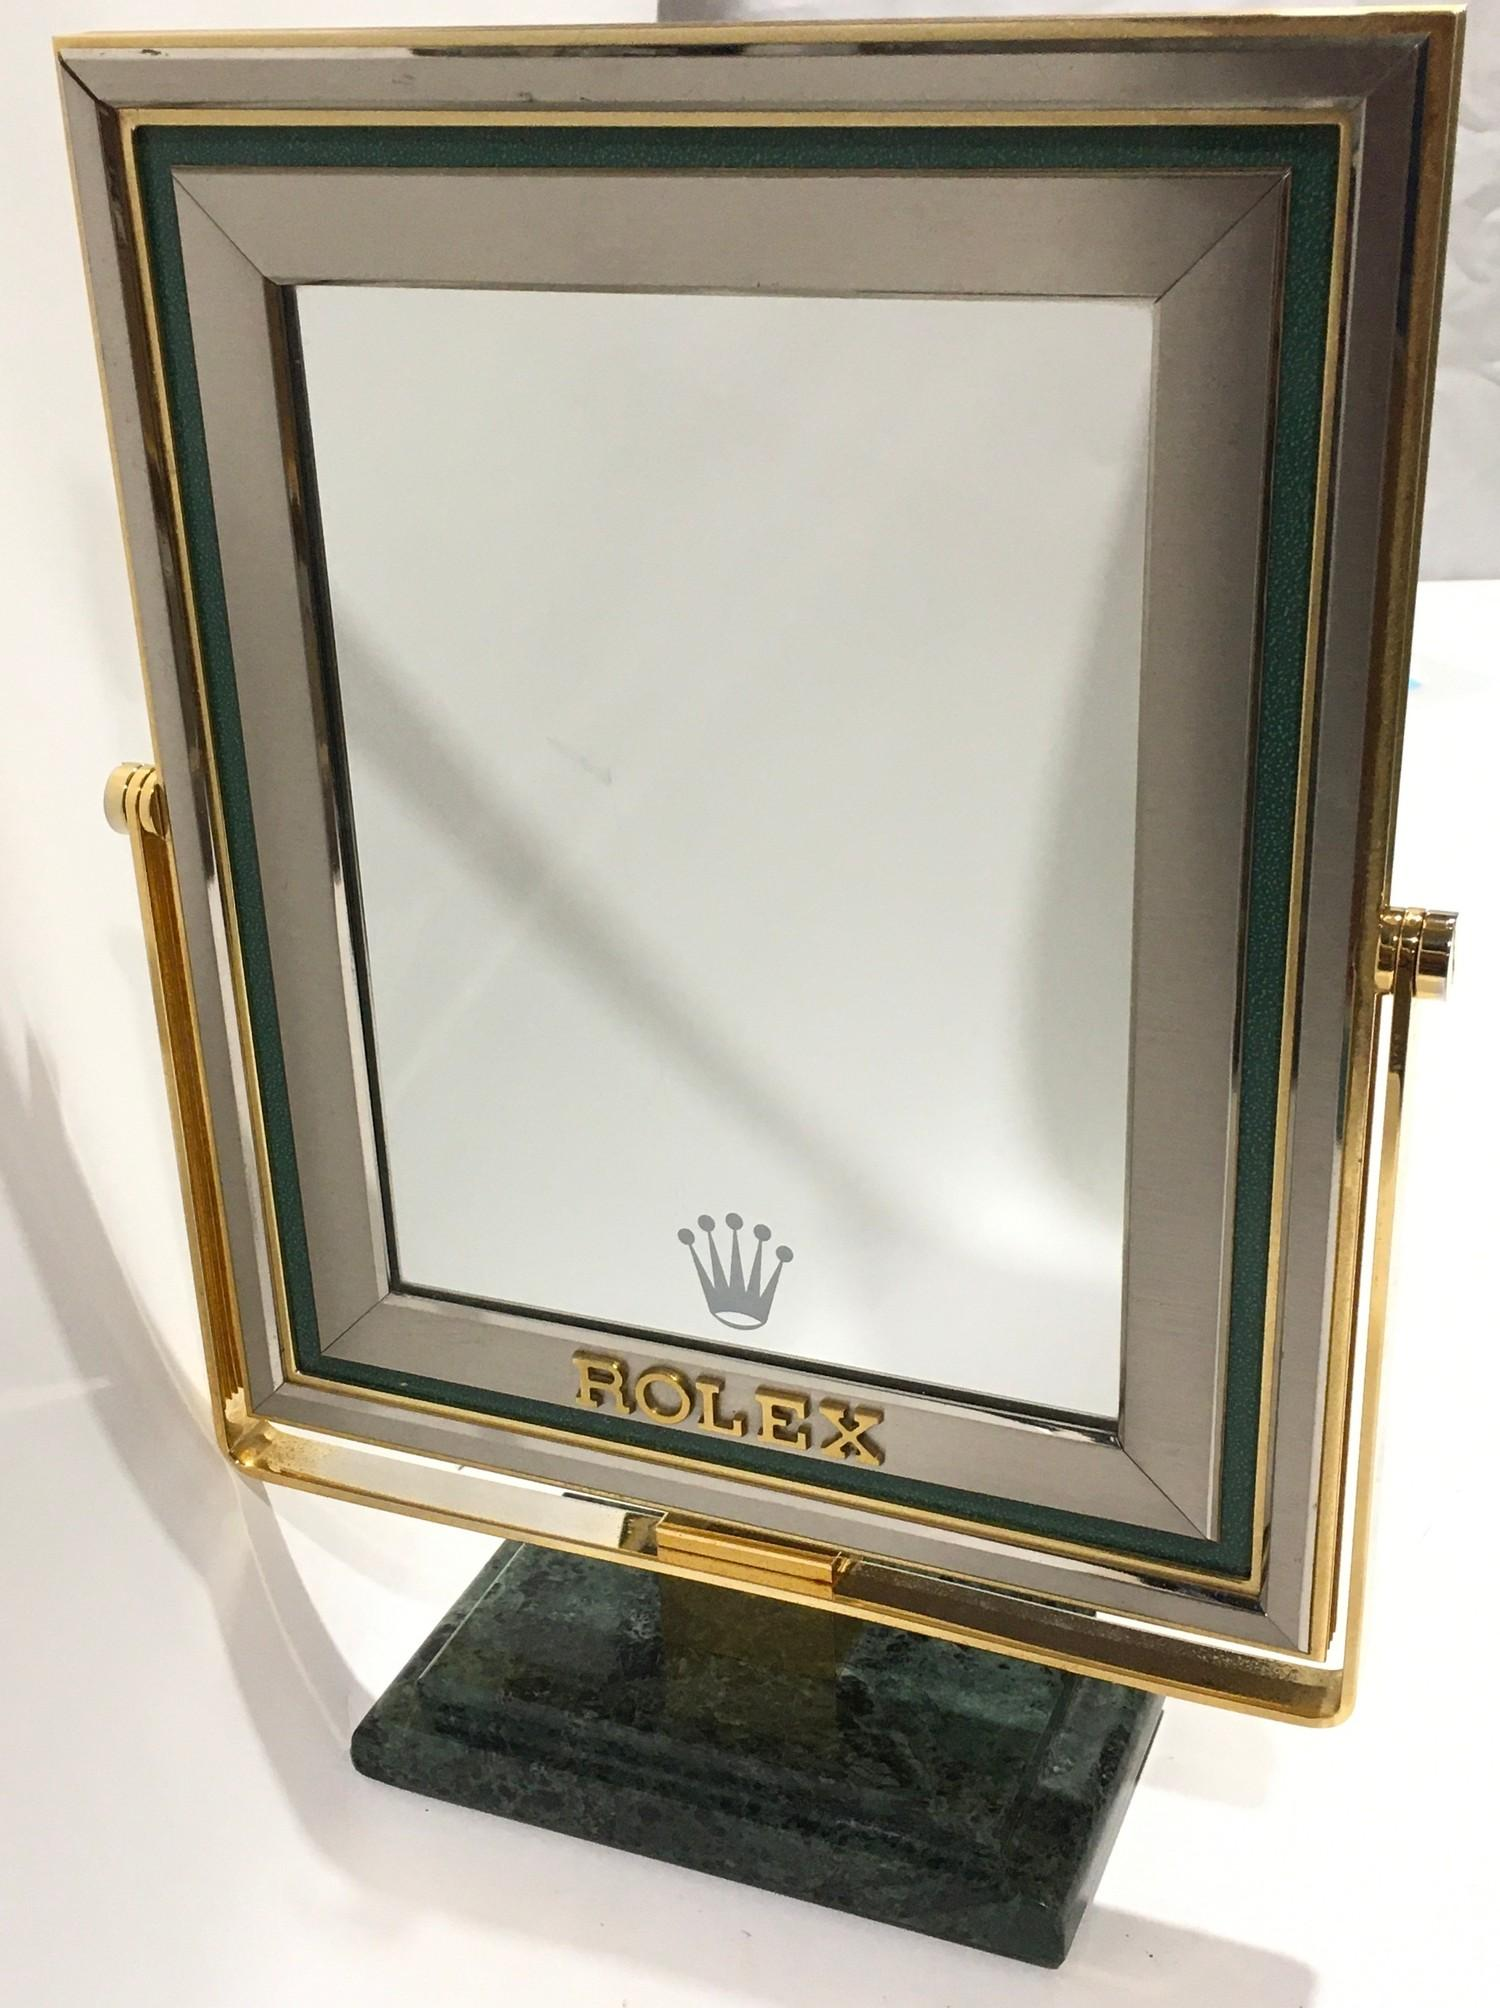 Genuine Rolex onyx based vanity mirror. 38cm tall, 27cm wide